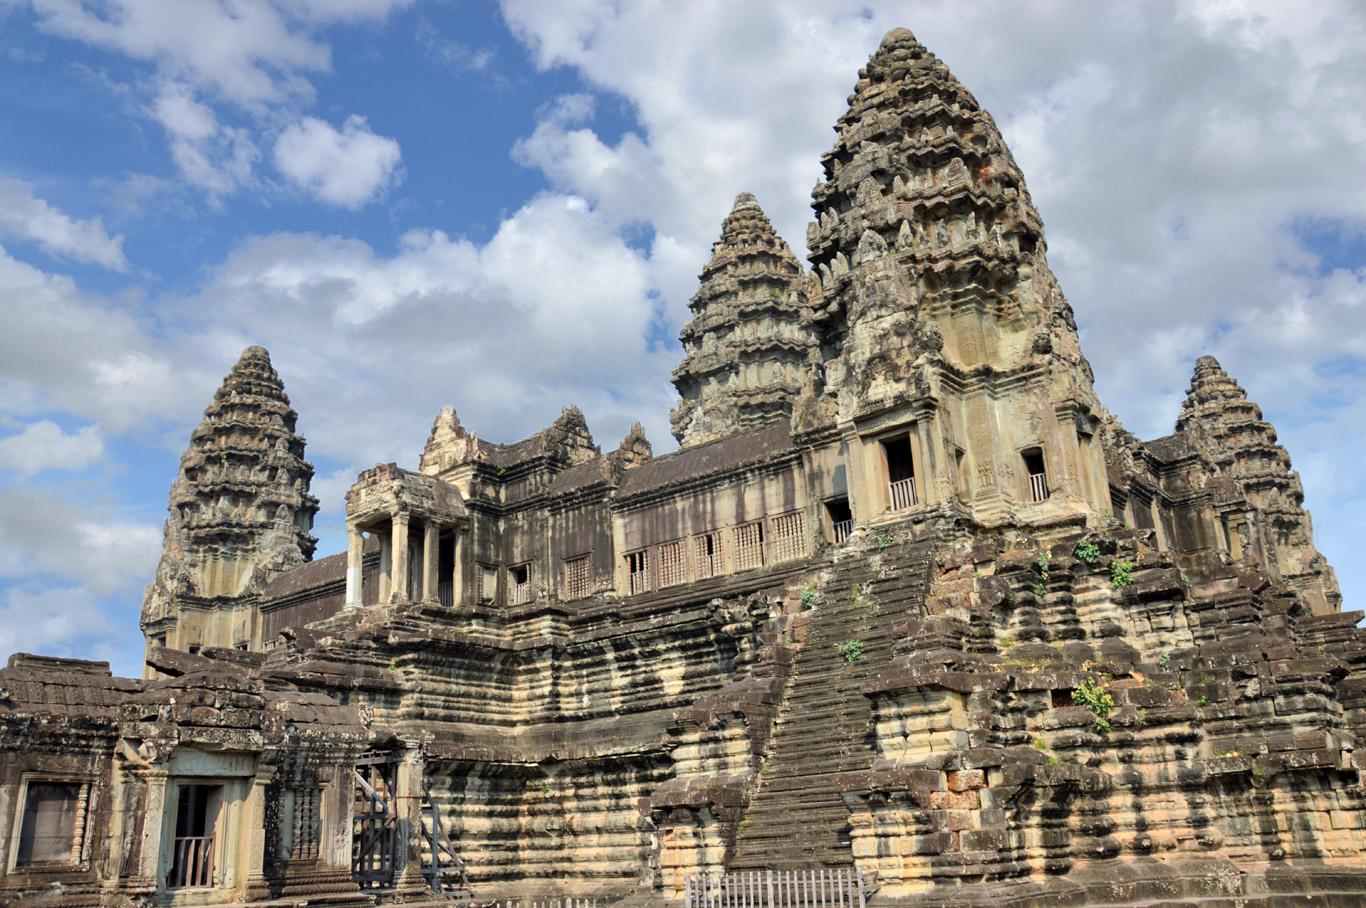 The highest level at Angkor Wat